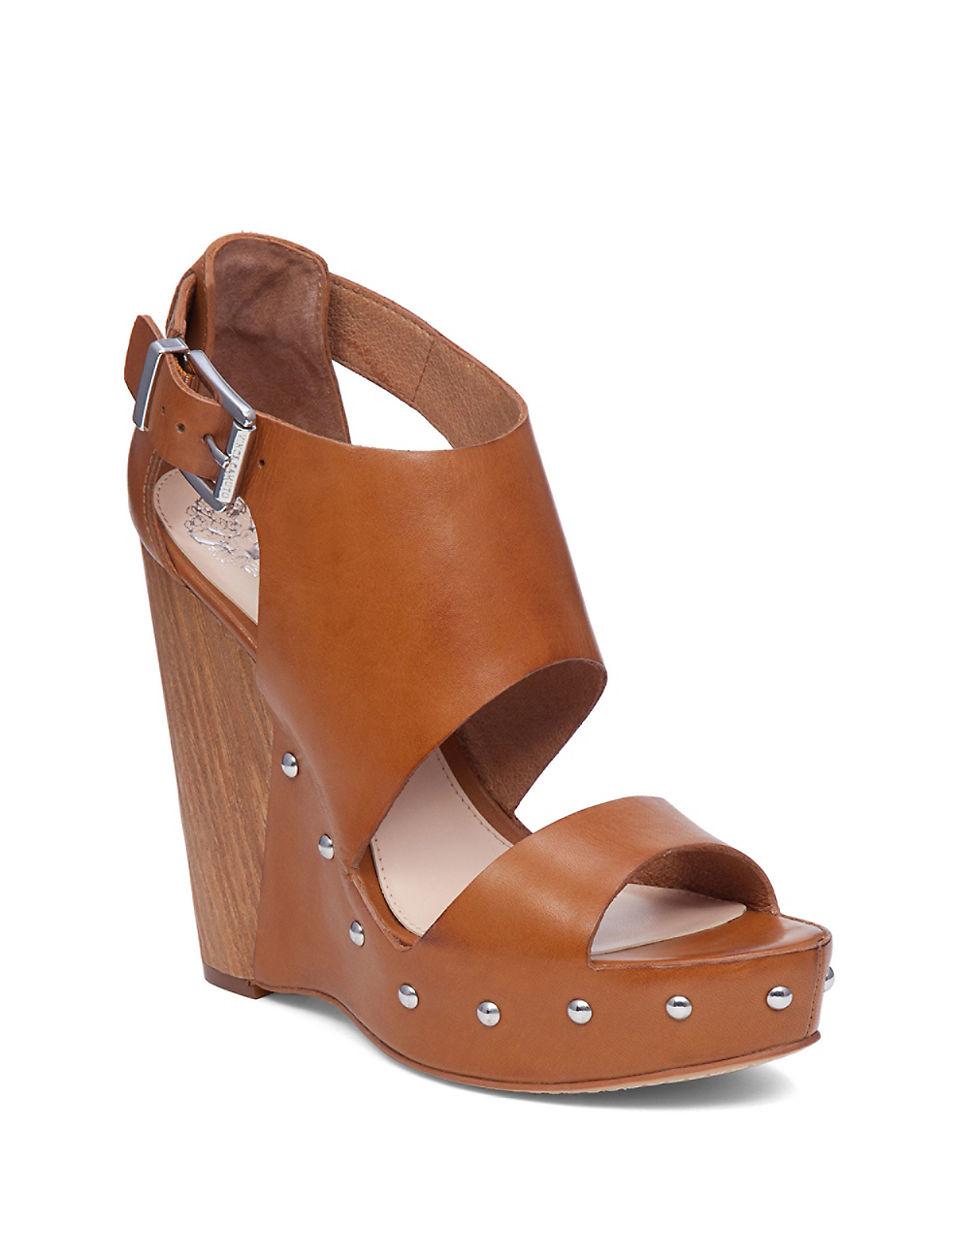 Vince Camuto Matta Leather Platform Sandals In Brown Lyst